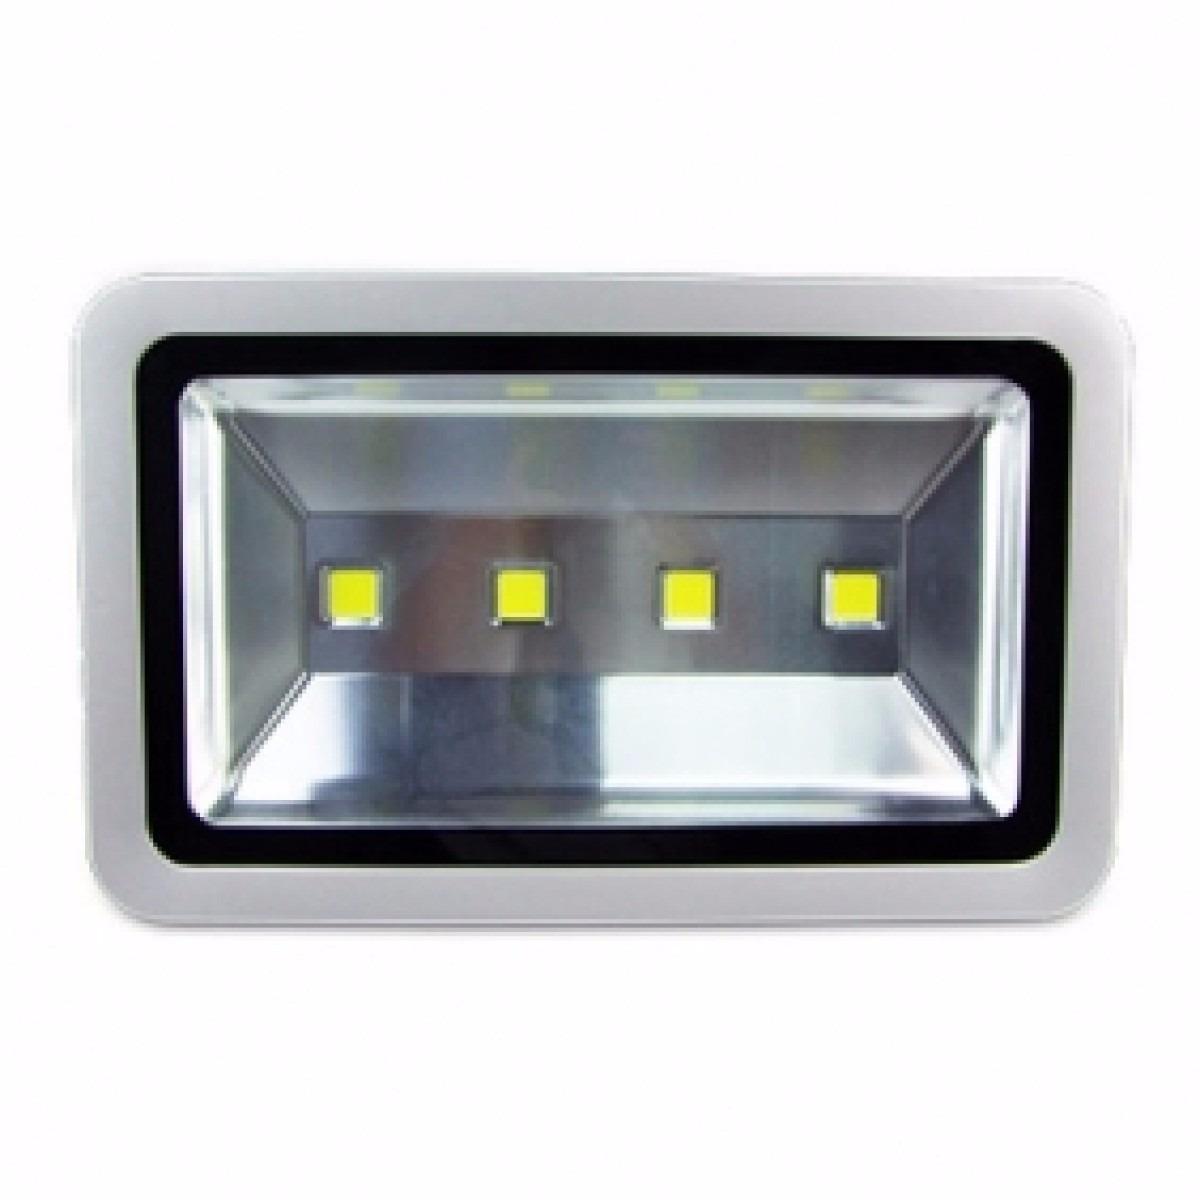 Refletor Led 200w Bivolt Holofote A Prova agua Branco Frio 110v 220V Até 90% Econômico  - HARDFAST INFORMÁTICA